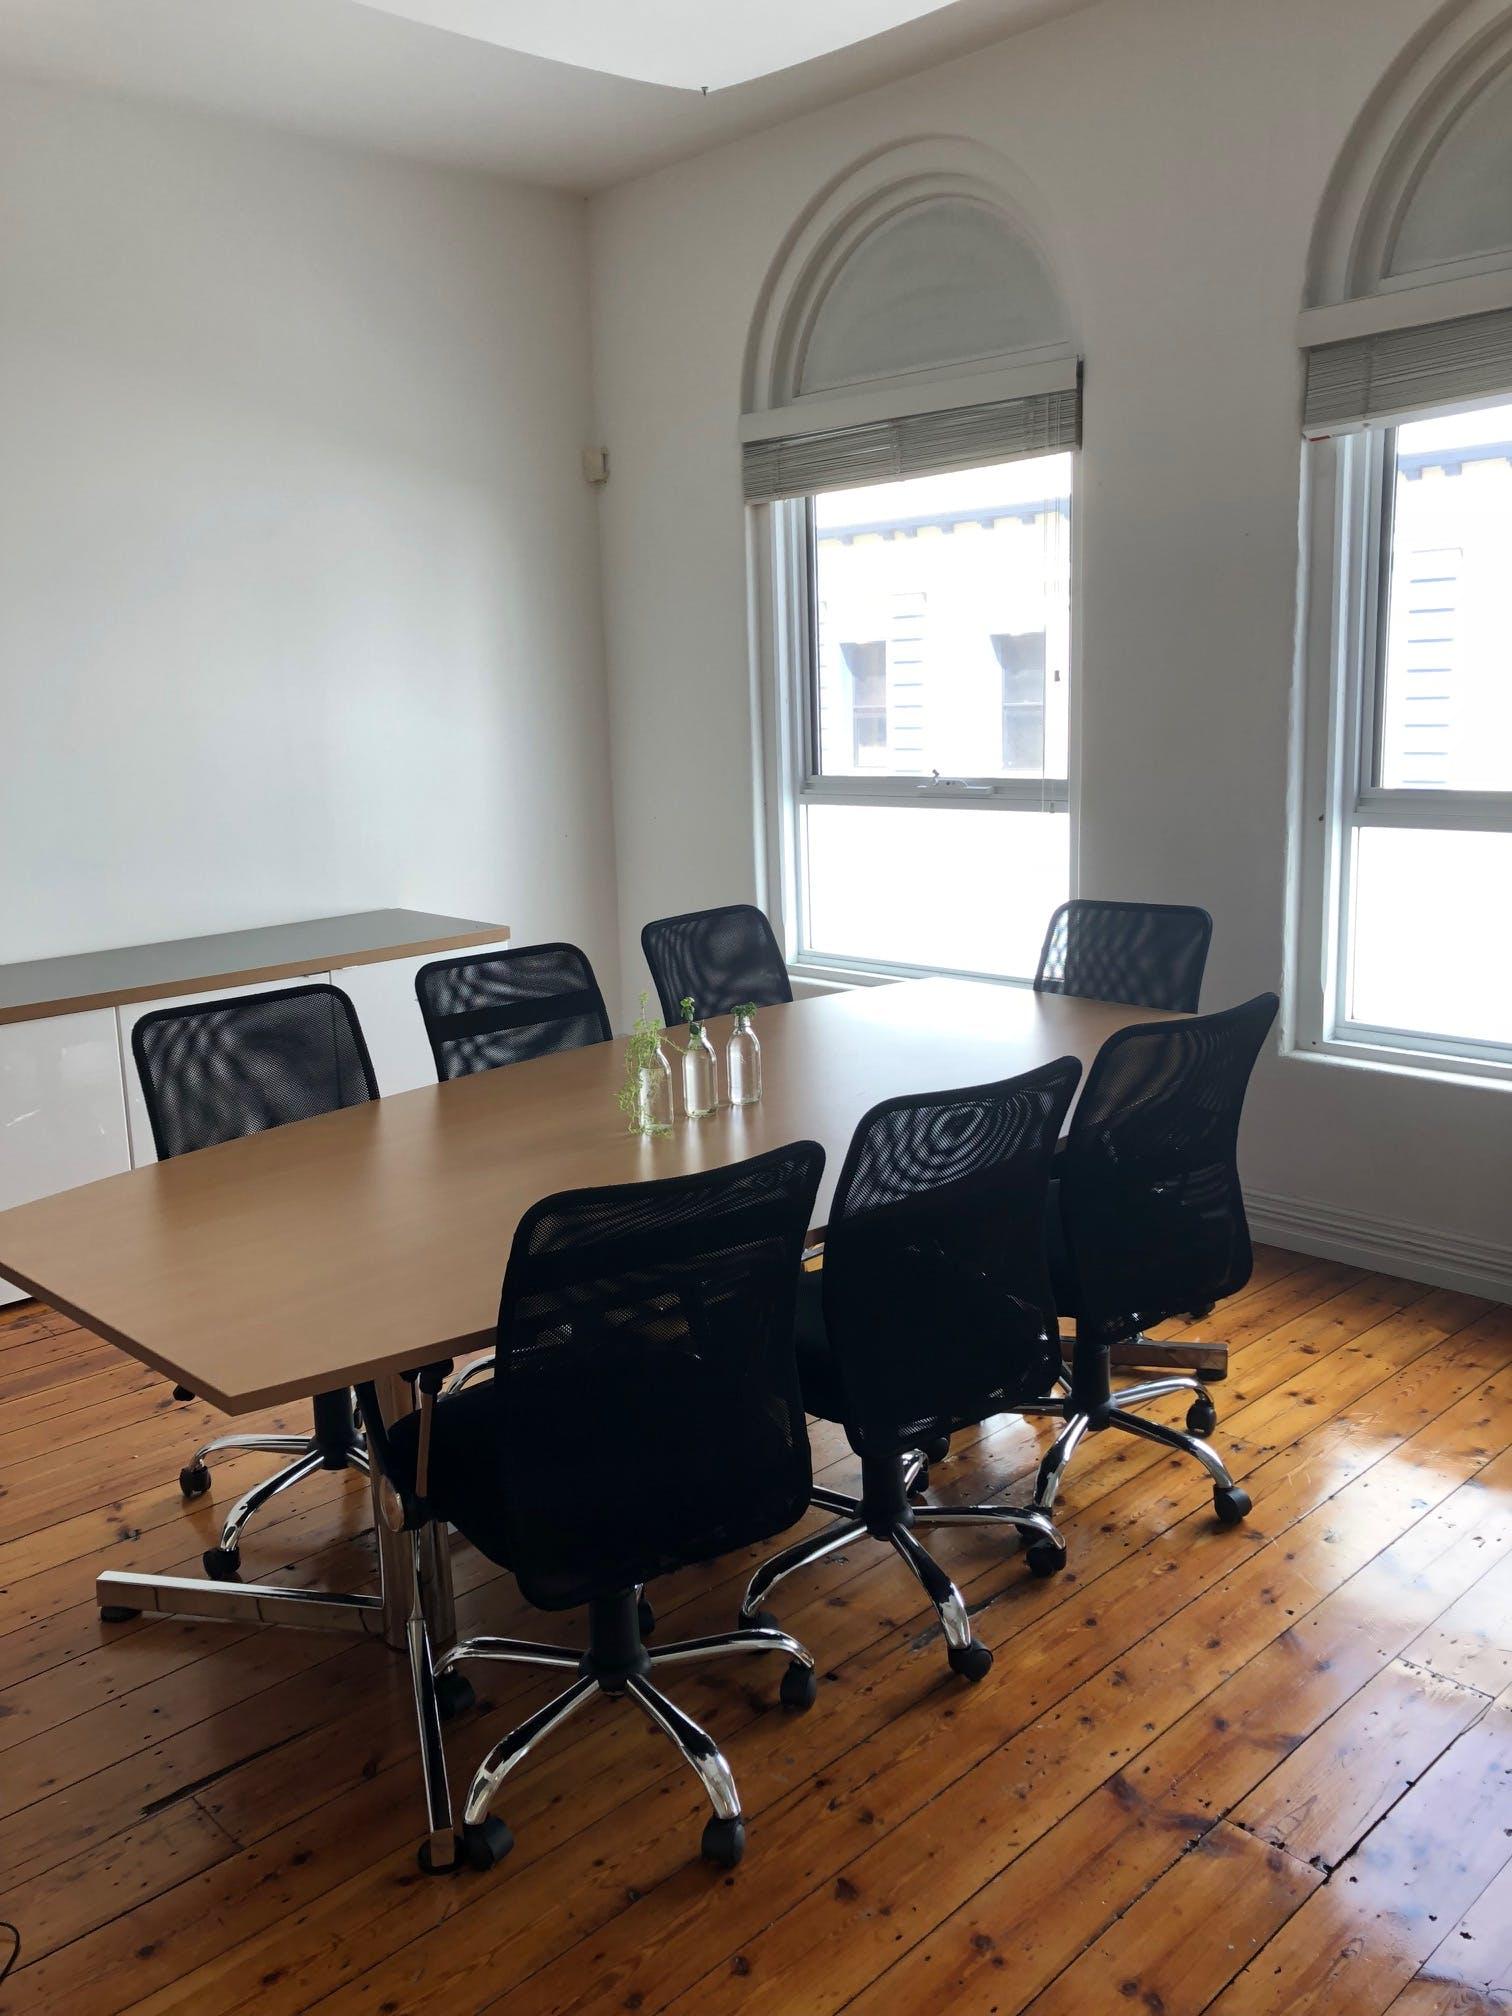 Boardroom, meeting room at Gemstar Perth, image 1